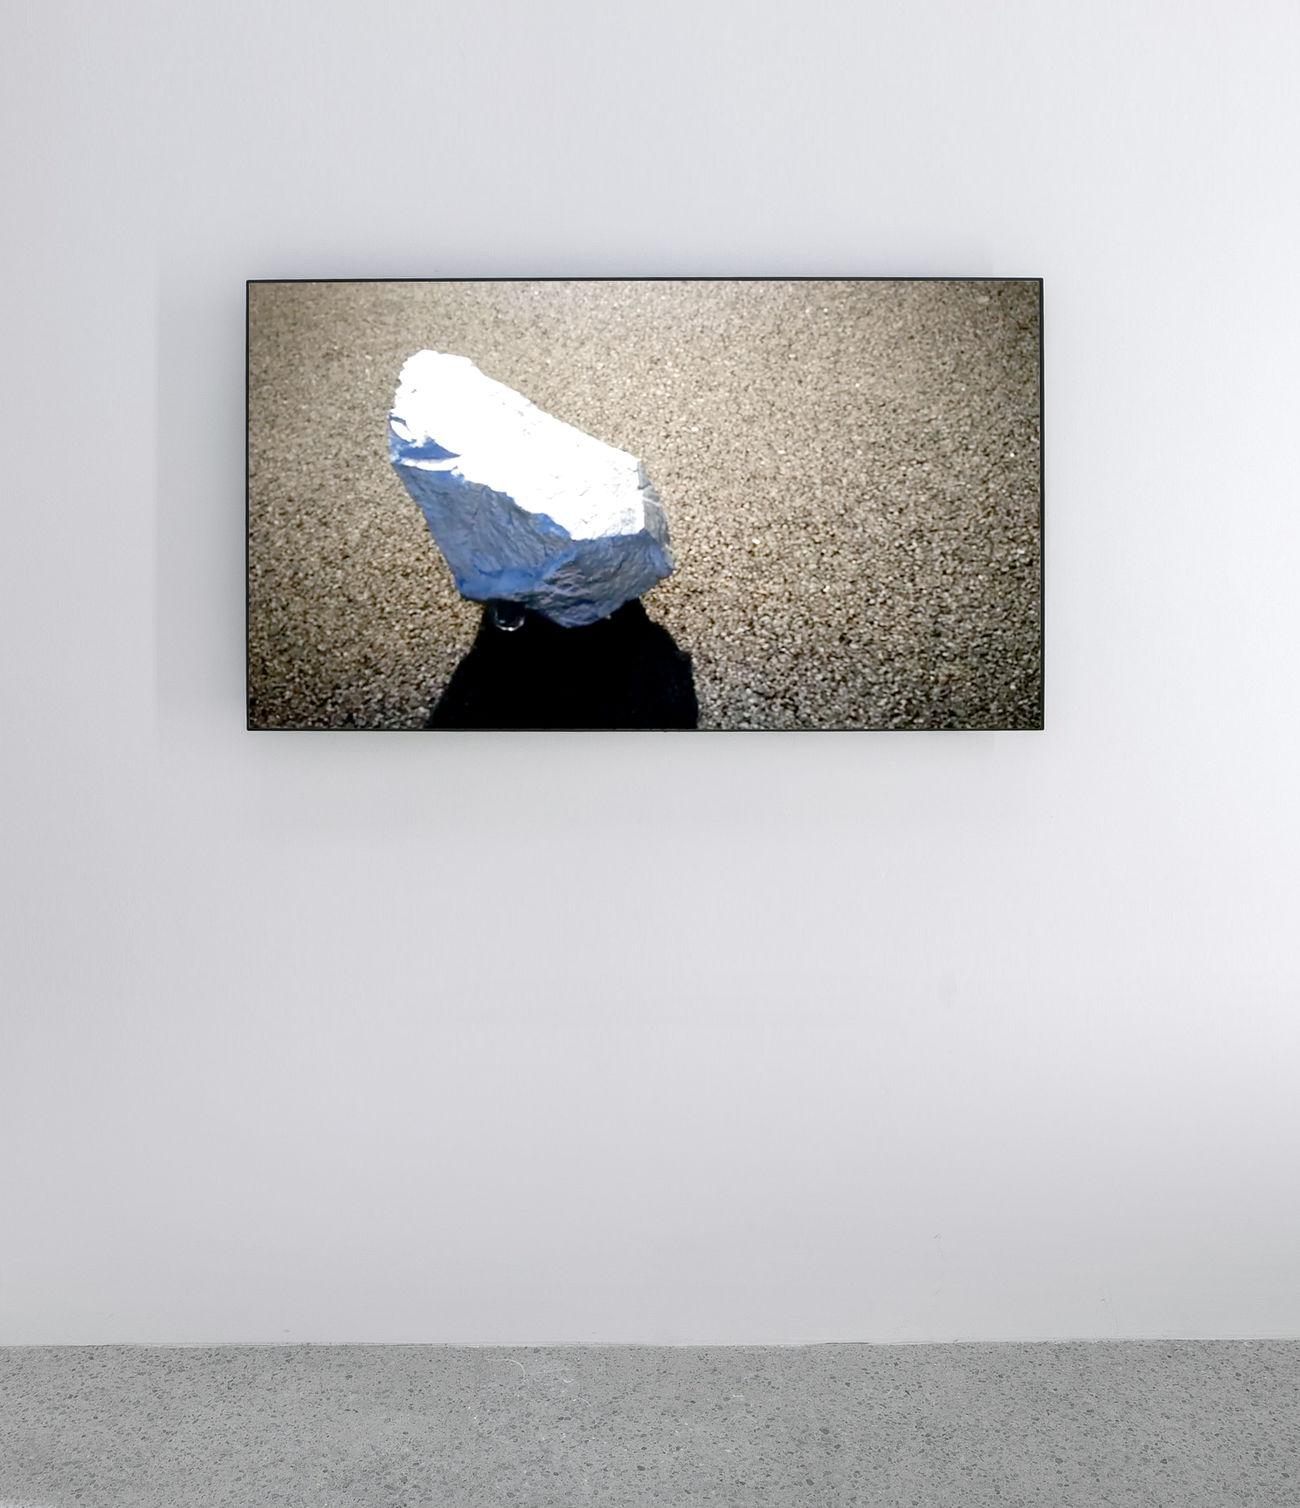 Art Gallery Installation Loop Meteor Plasma Run Video